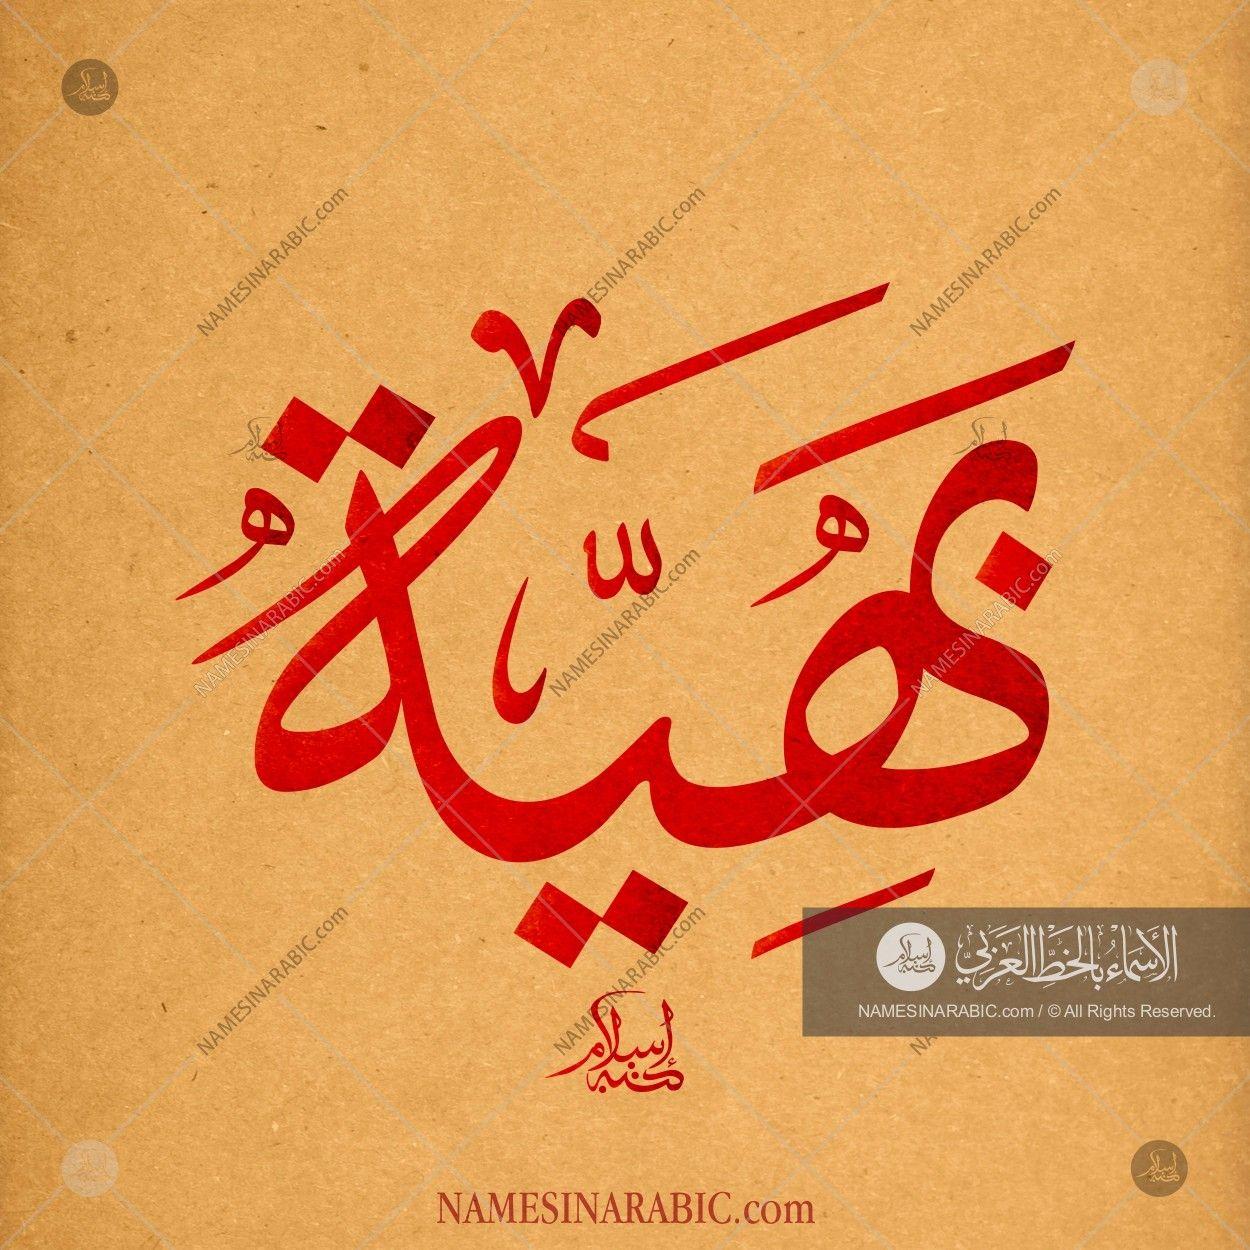 Bahiyya بهية Names In Arabic Calligraphy Name 1480 Calligraphy Name Calligraphy Arabic Calligraphy